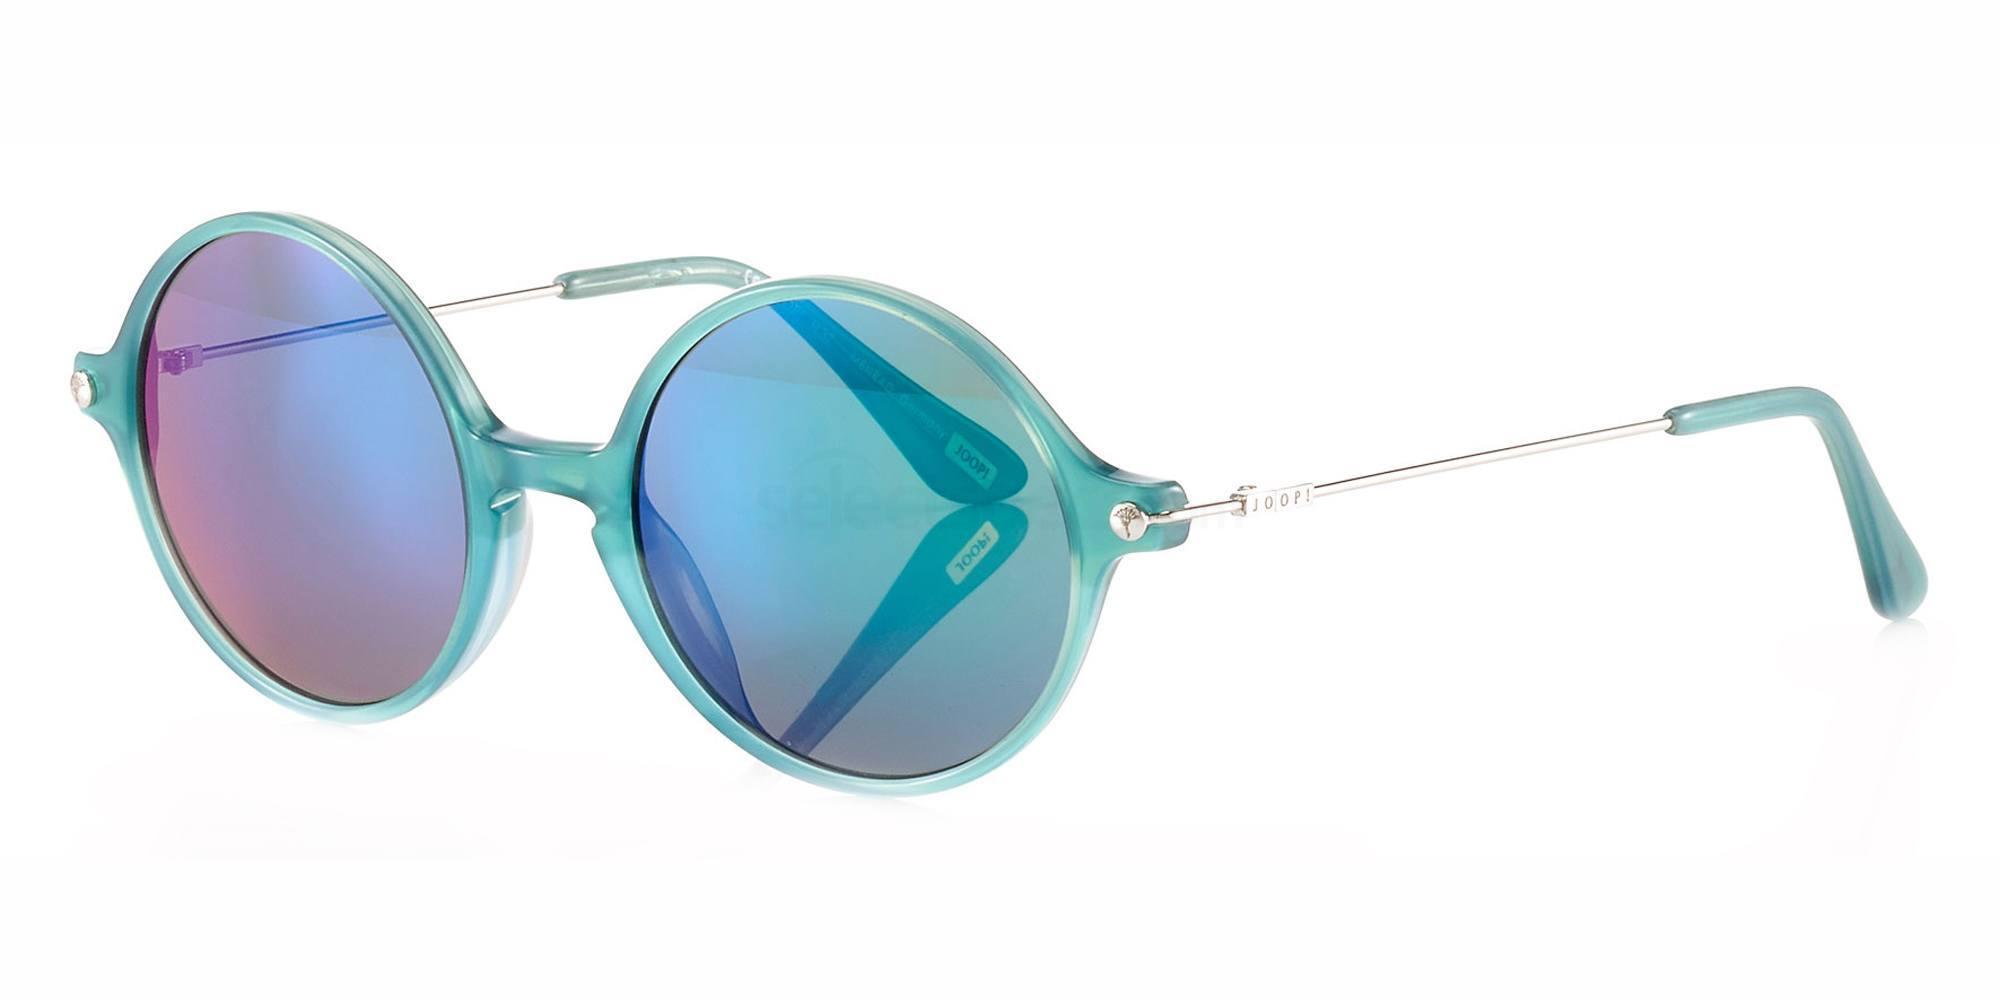 Joop sunglasses ss16